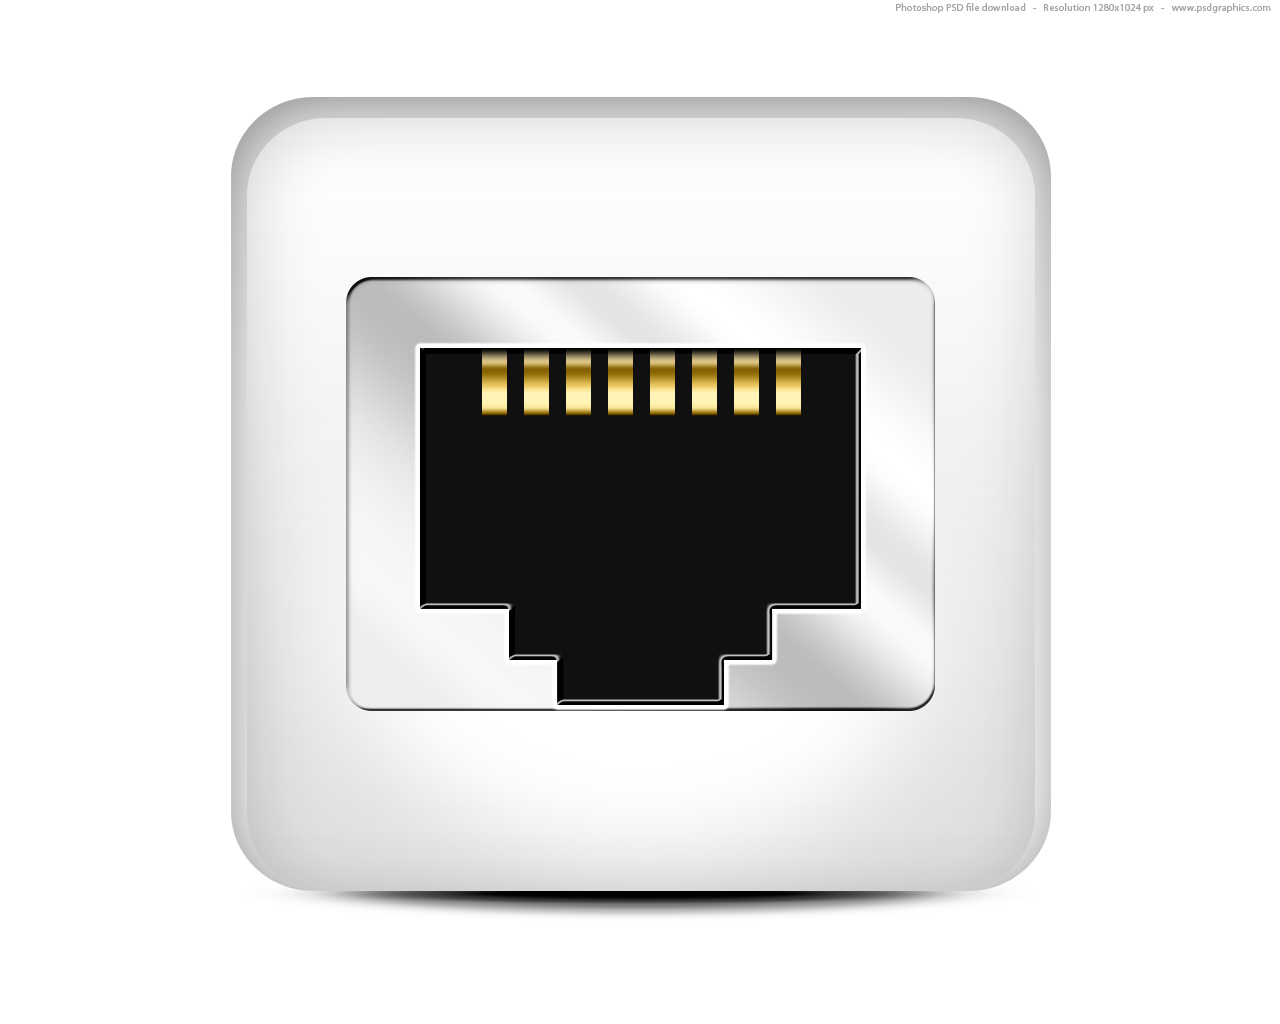 Ethernet Clipart.